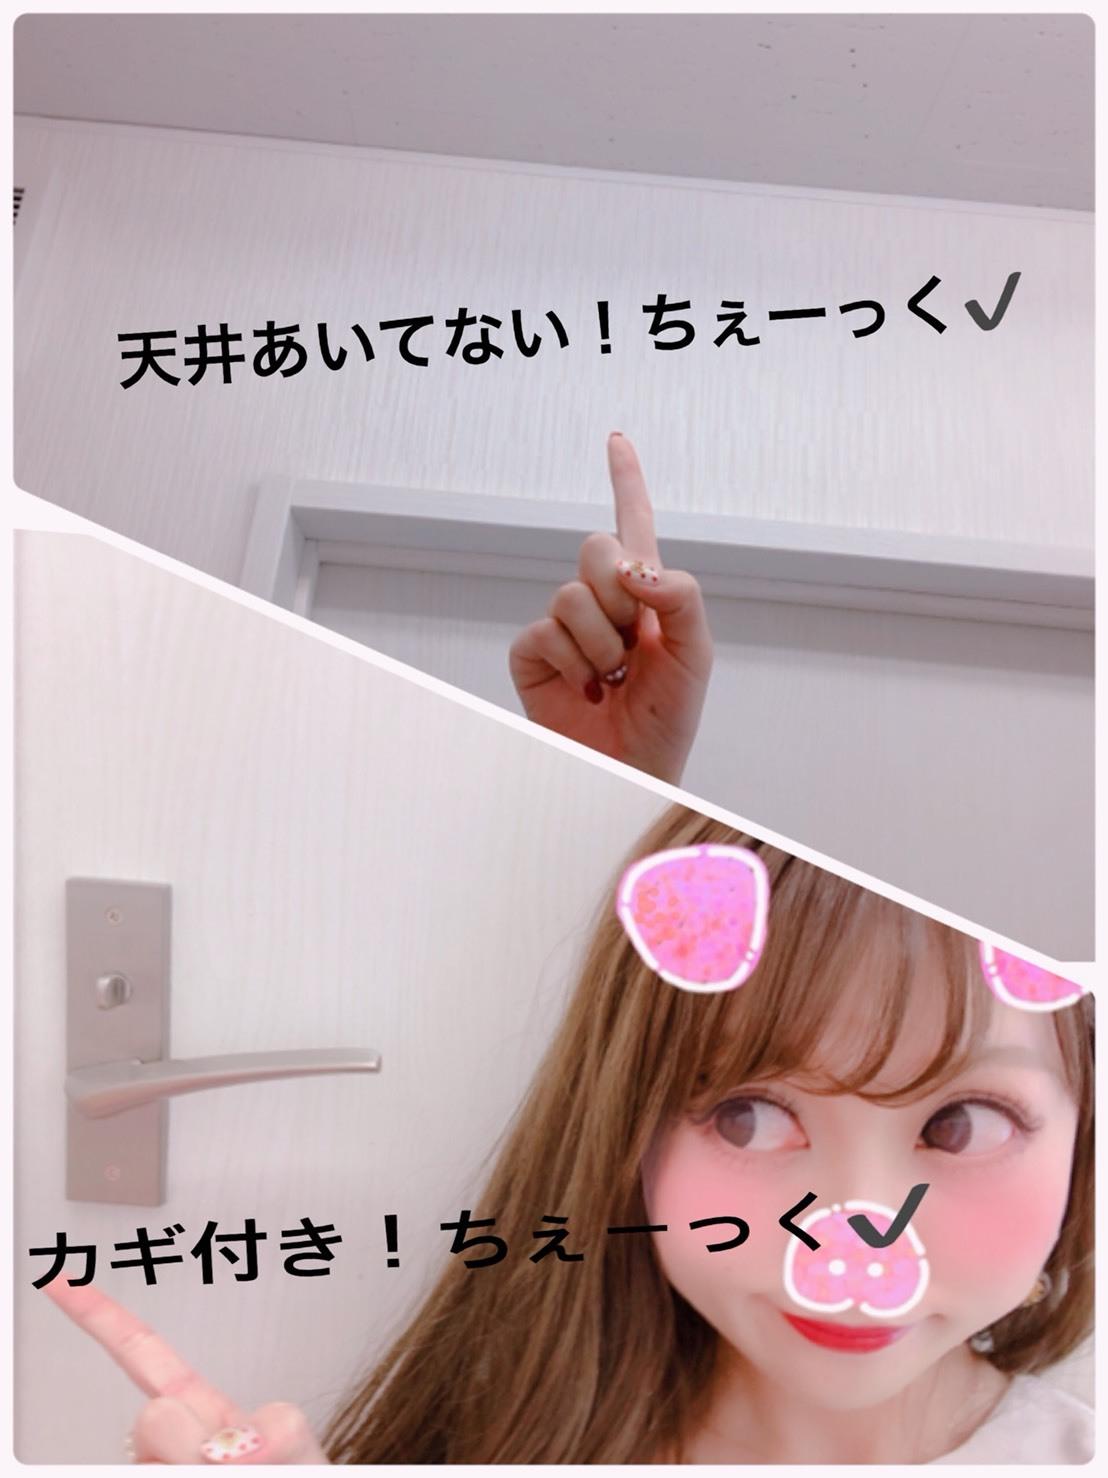 S__15007752.jpg